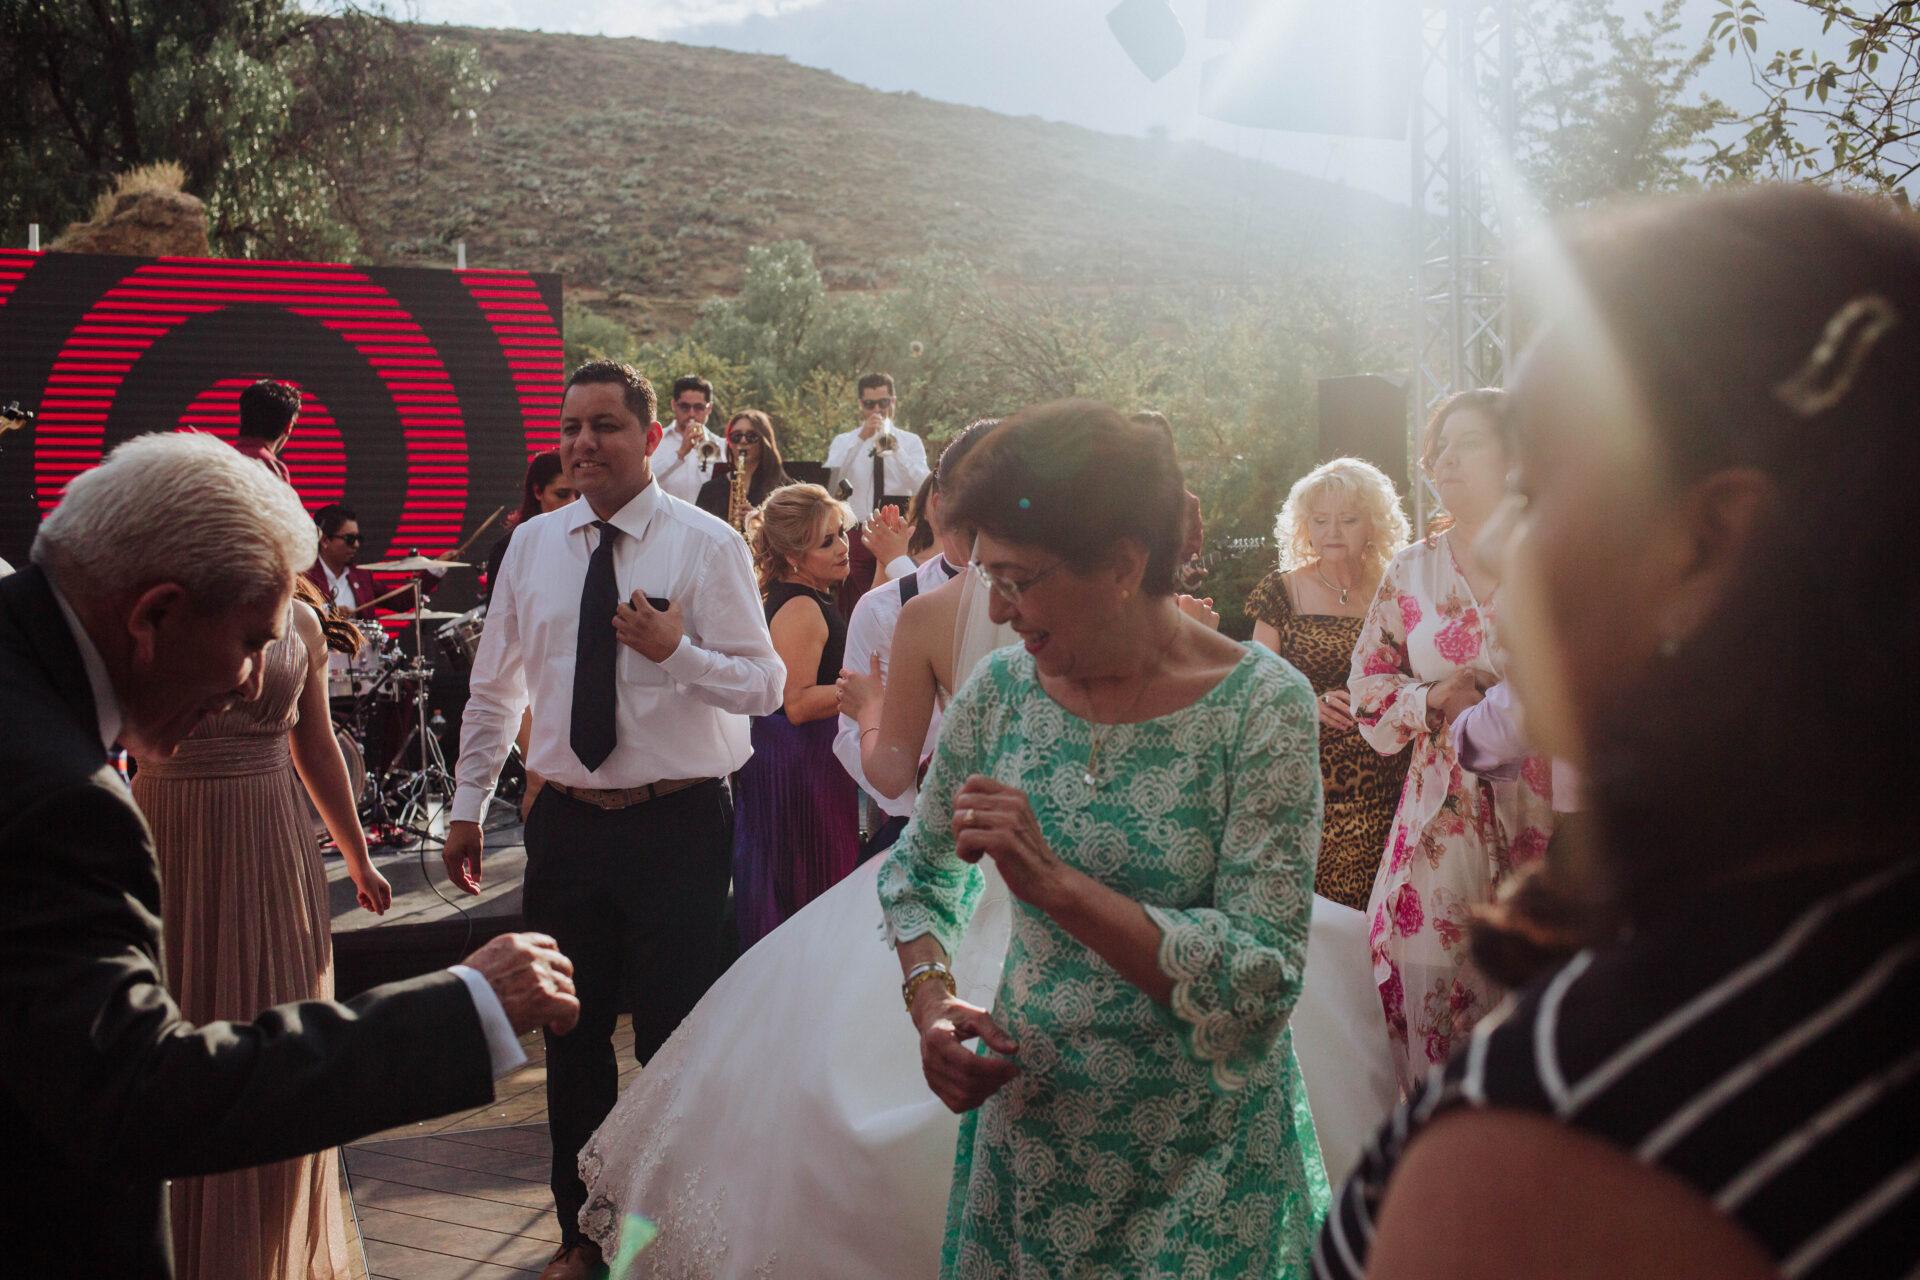 javier_noriega_fotografo_bodas_exhacienda_las_mercedes_zacatecas_wedding_photographer18a